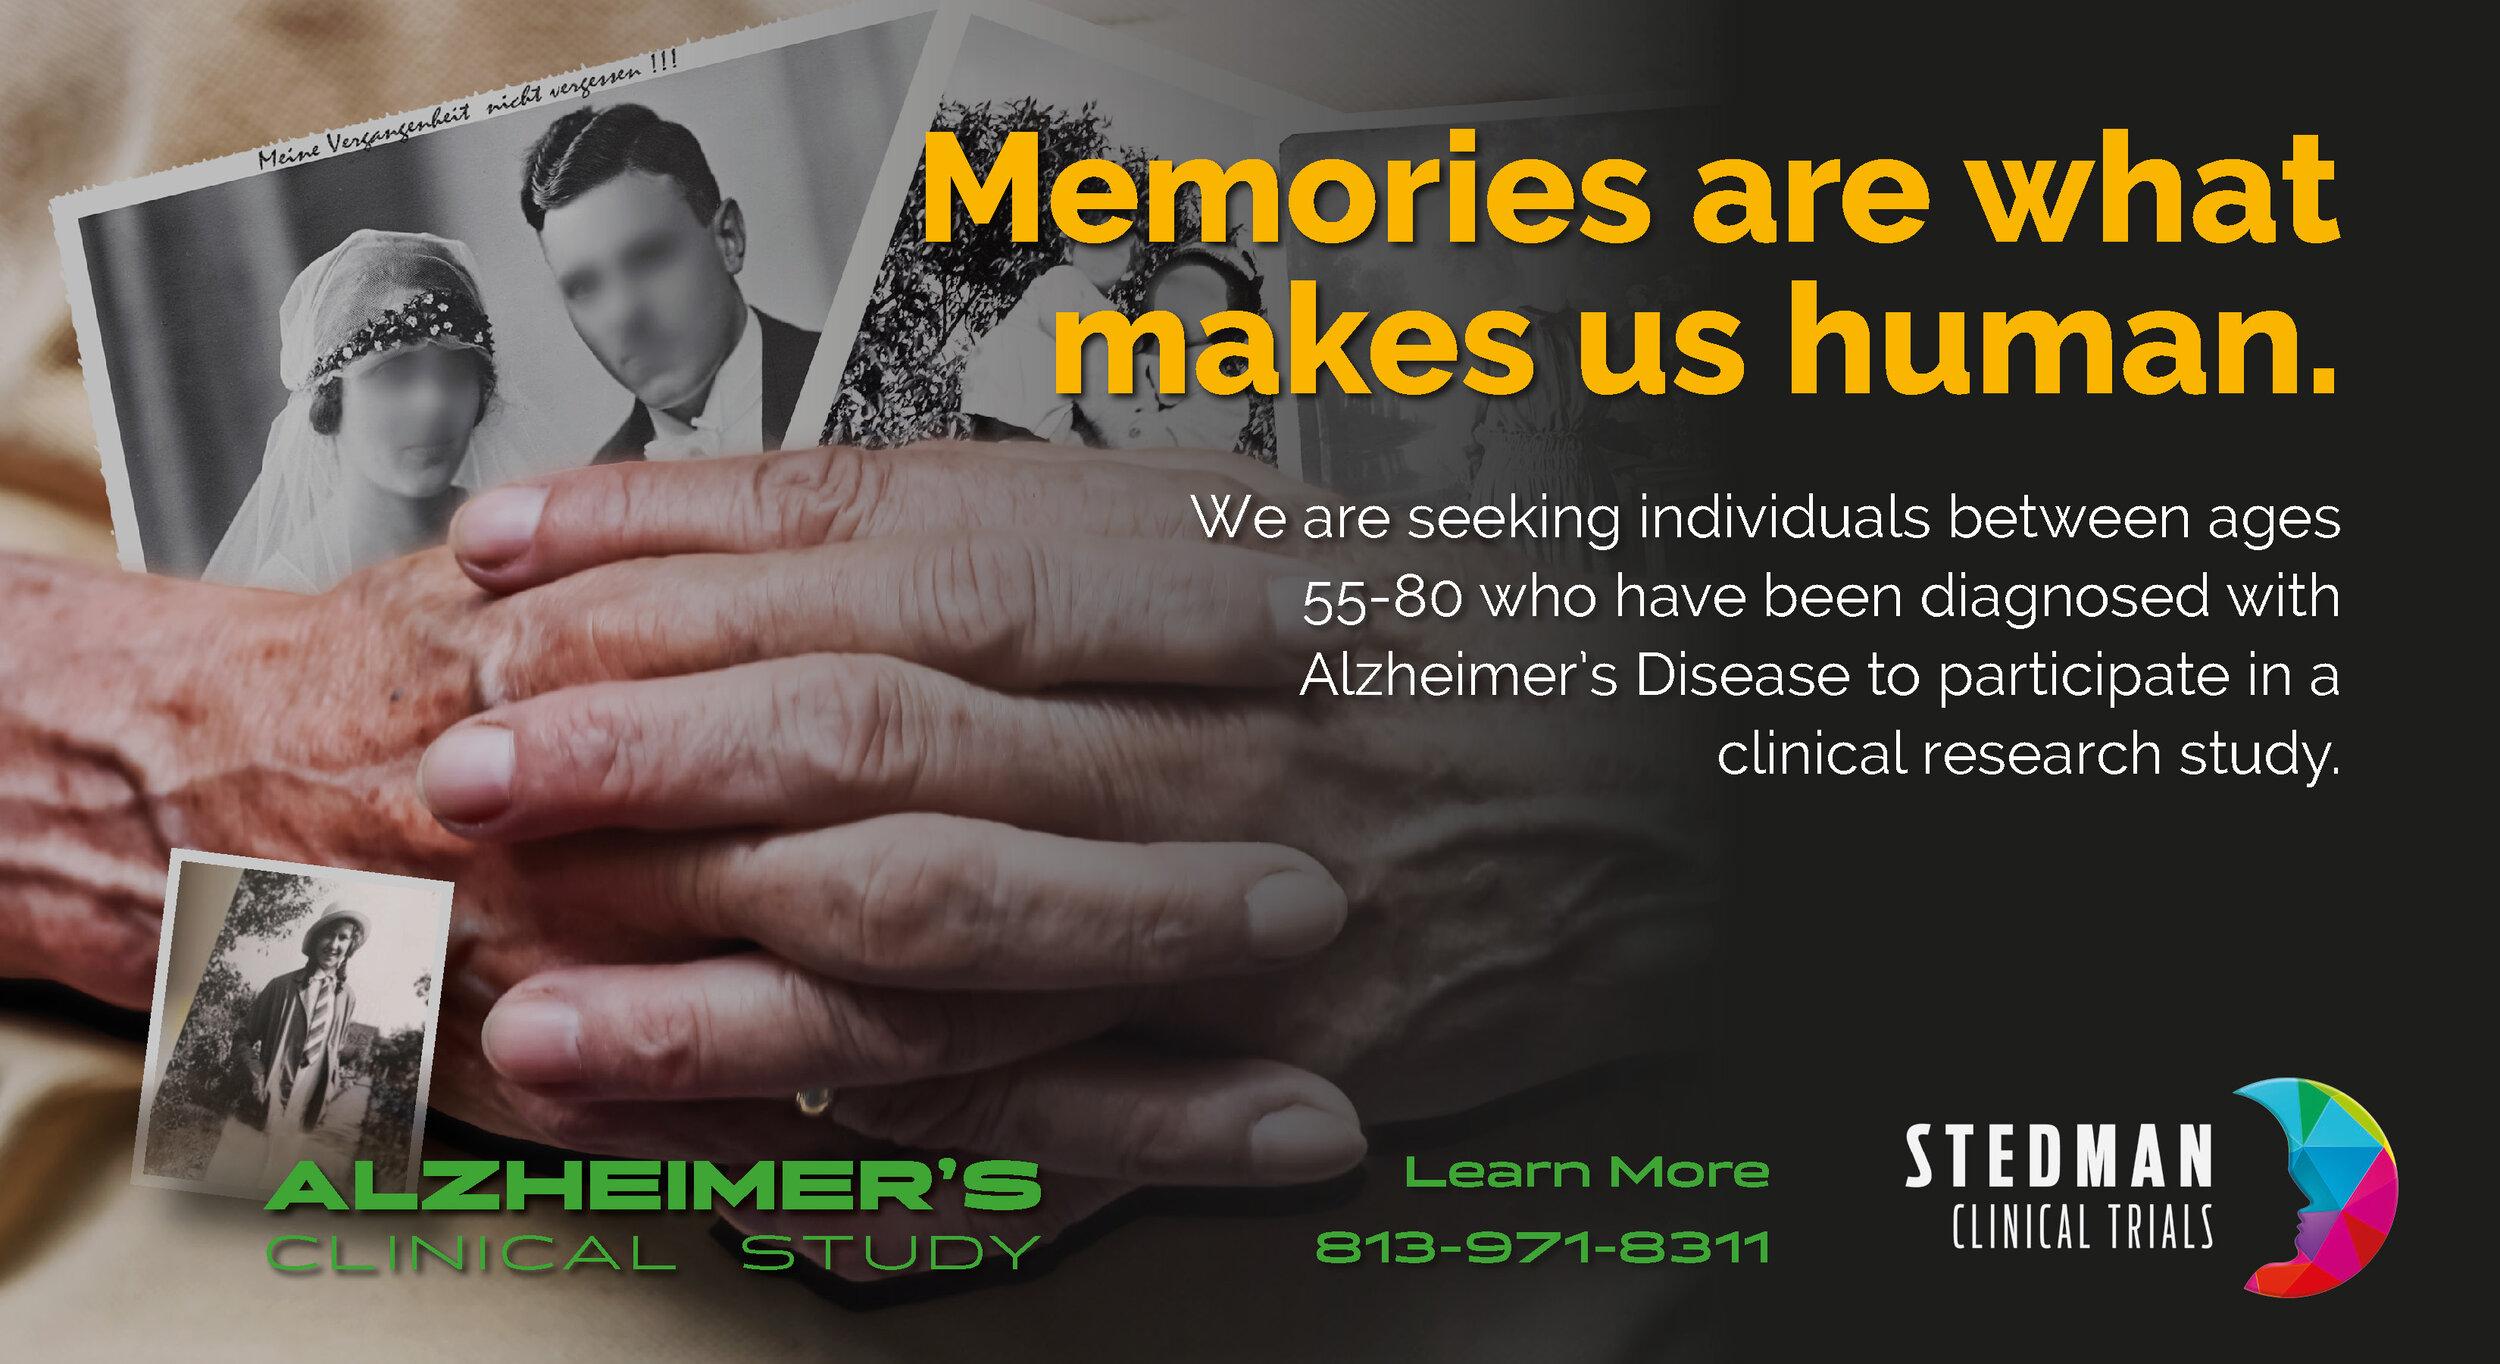 Alzheimer's Clinical Trial